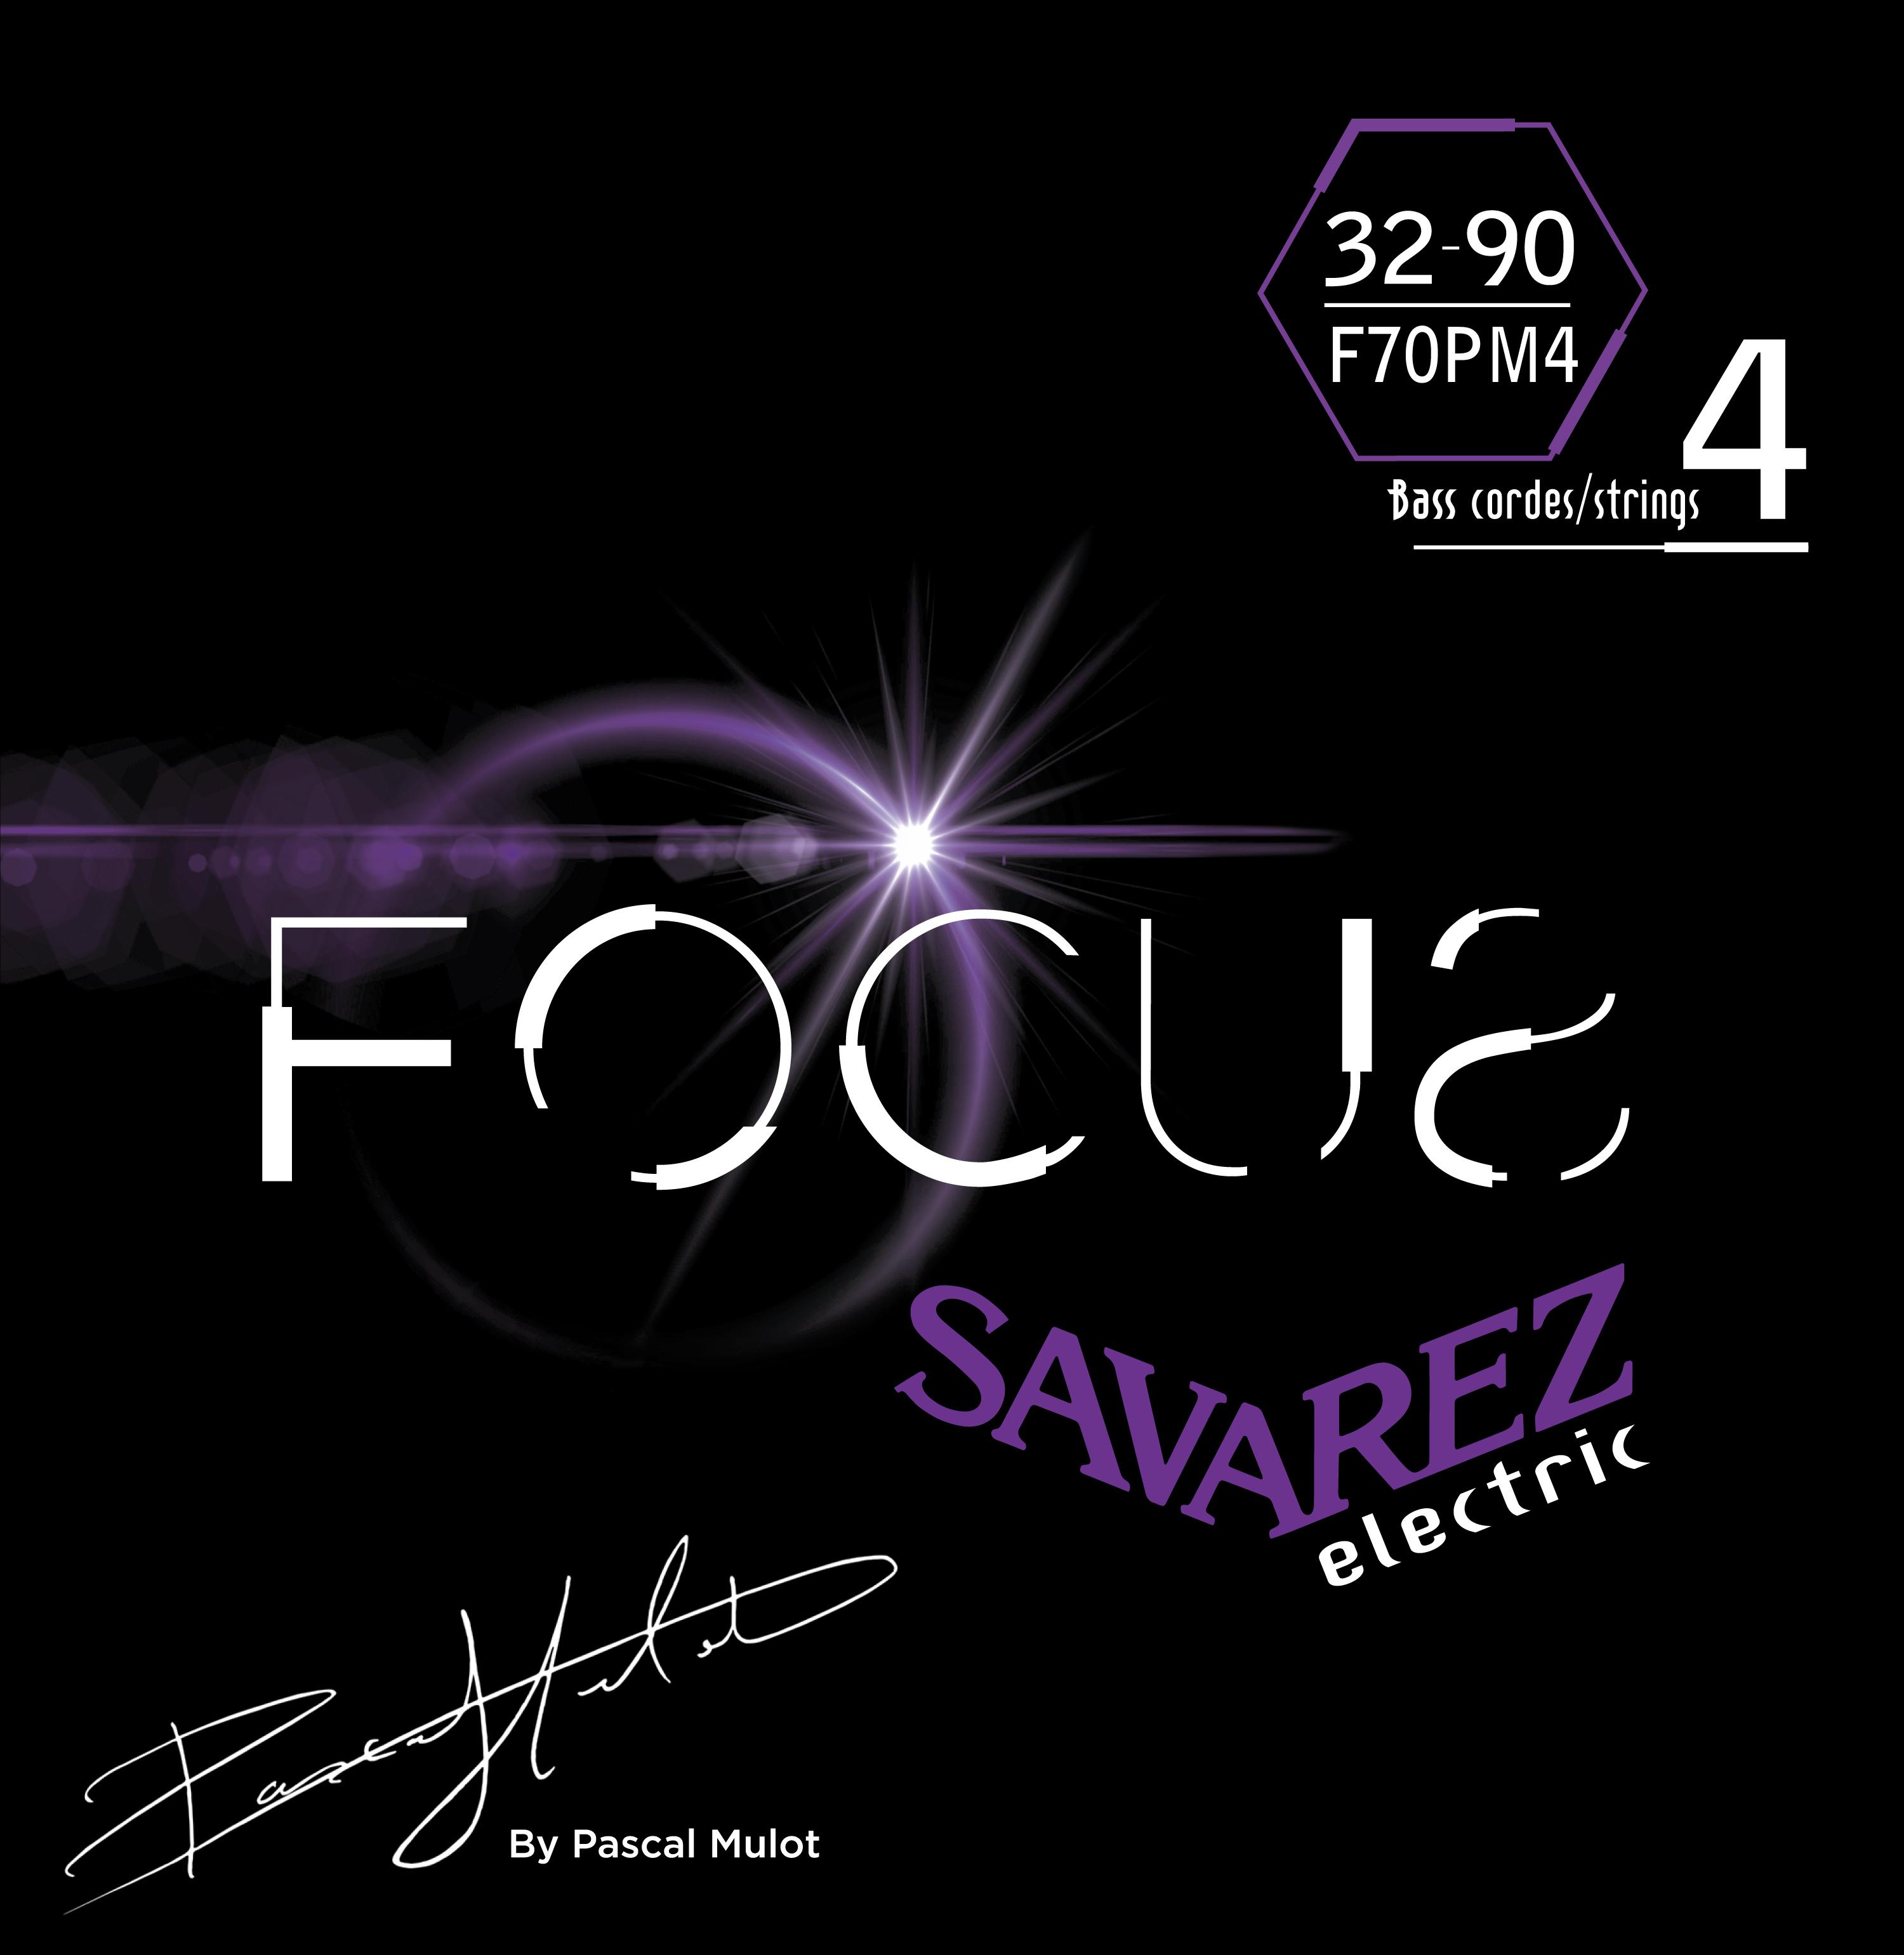 SAVAREZ ELECTRIC FOCUS F70PM4